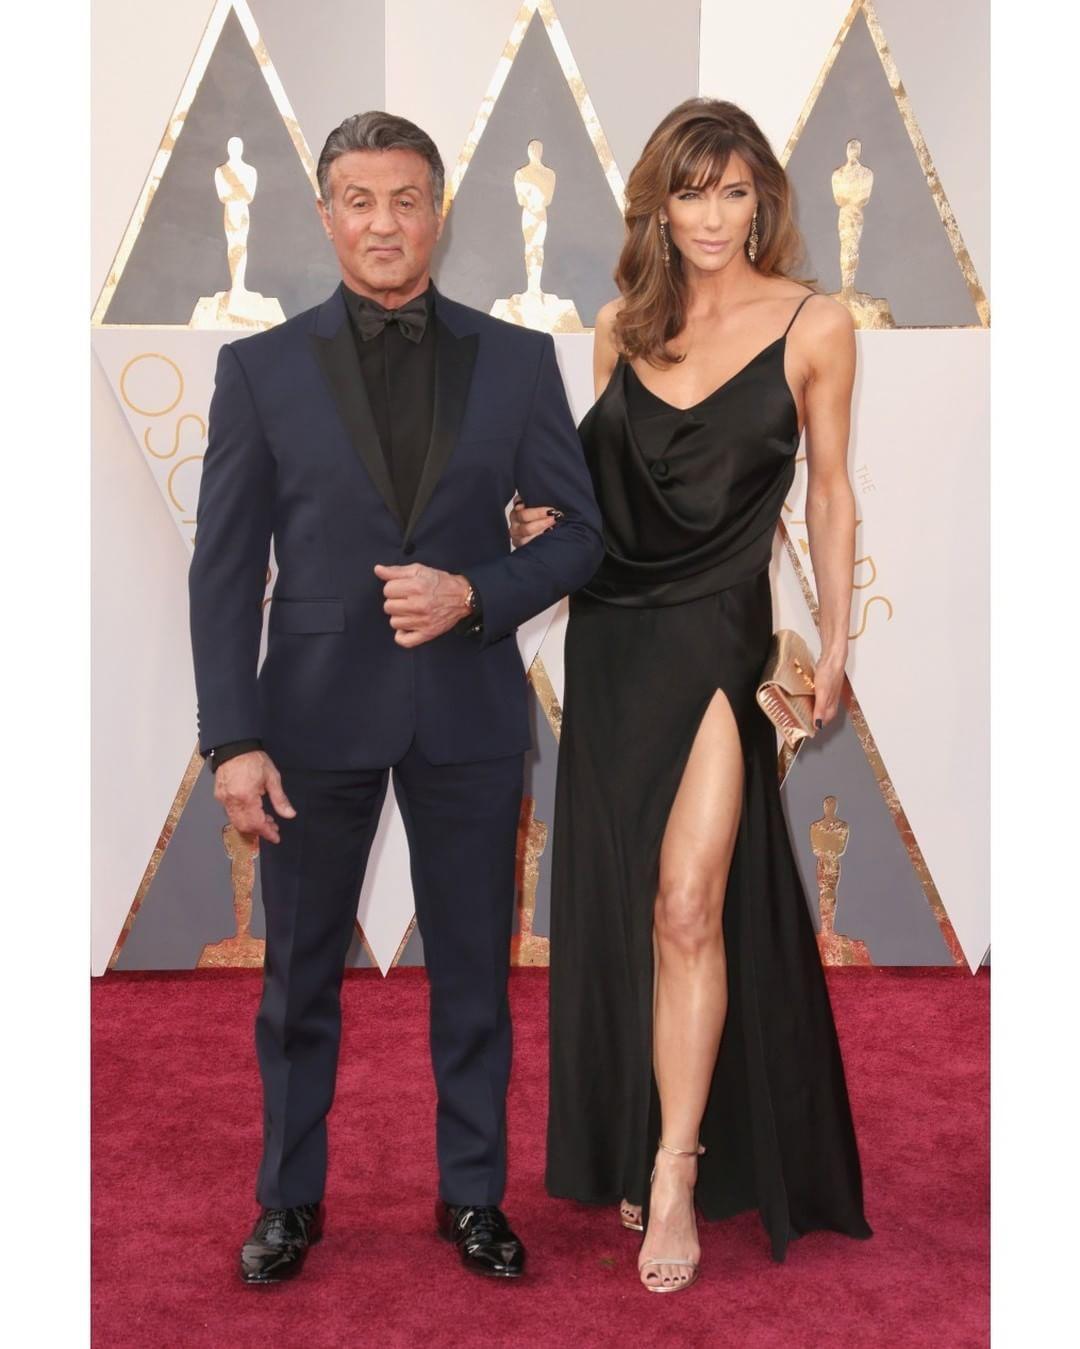 Sylvester Stallone's wife Jennifer Flavin wears Saint Laurent at Oscars 2016